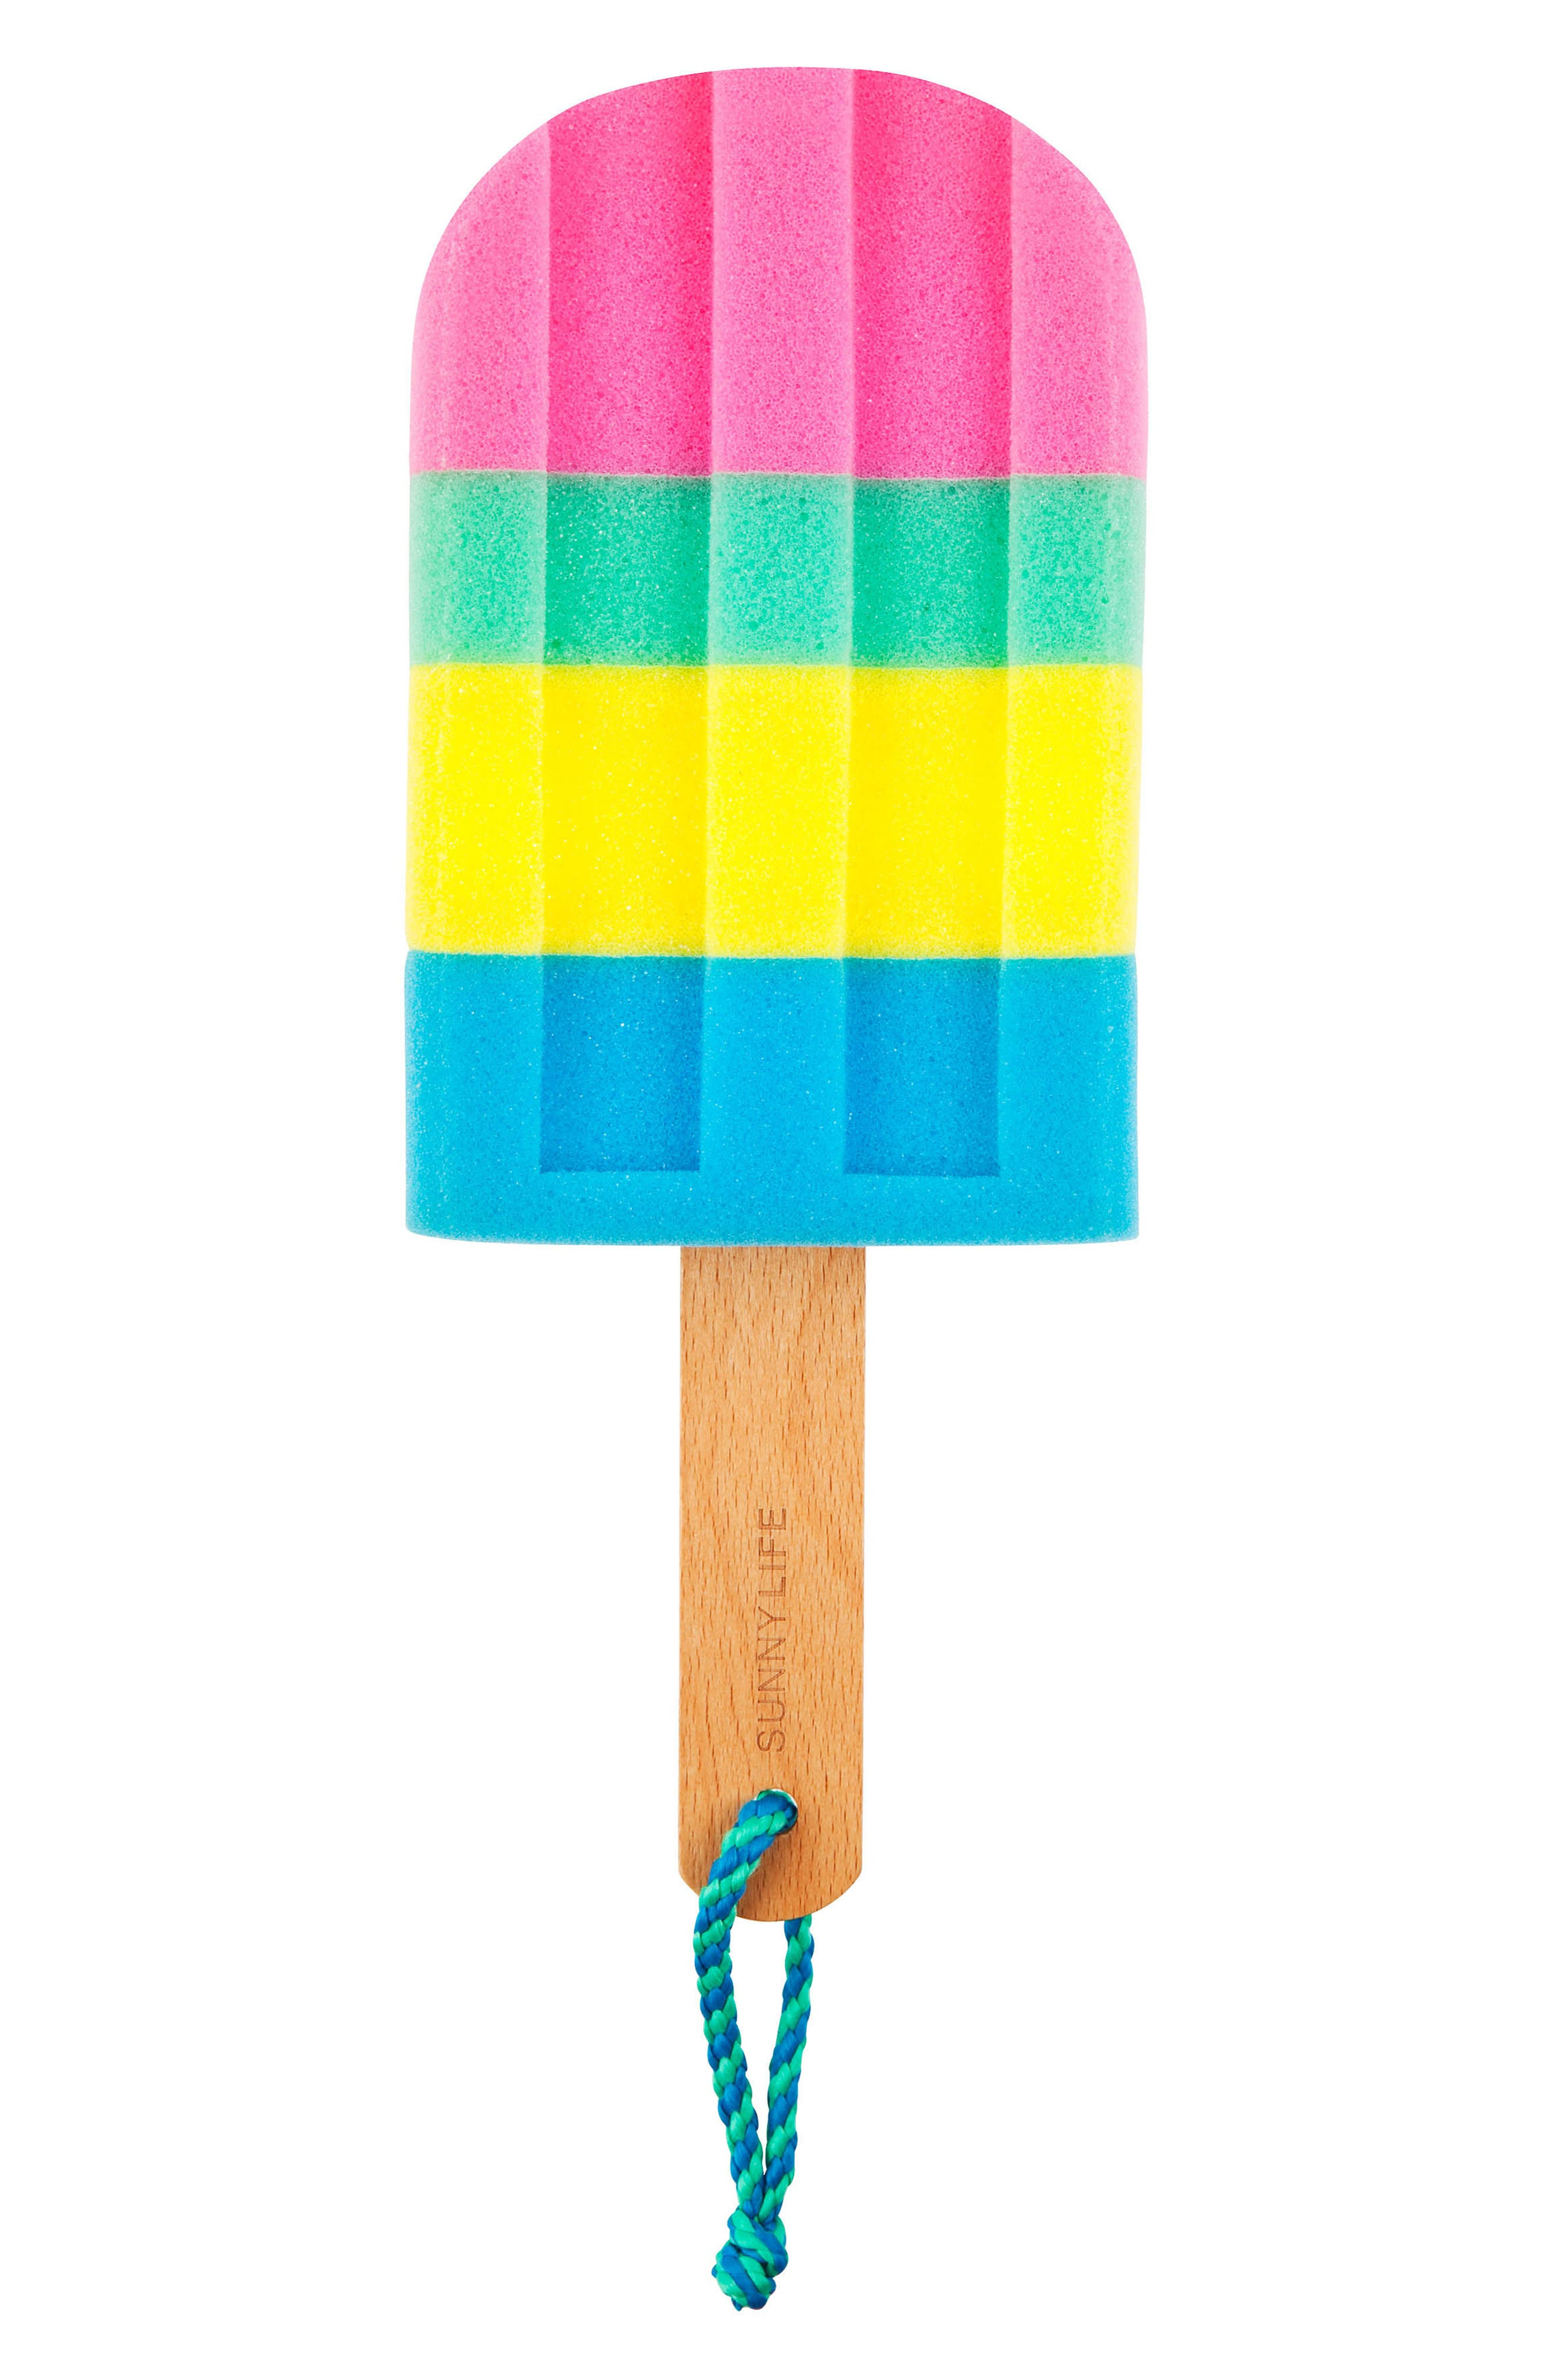 Ice Lolly Bath Sponge,                         Main,                         color, 400